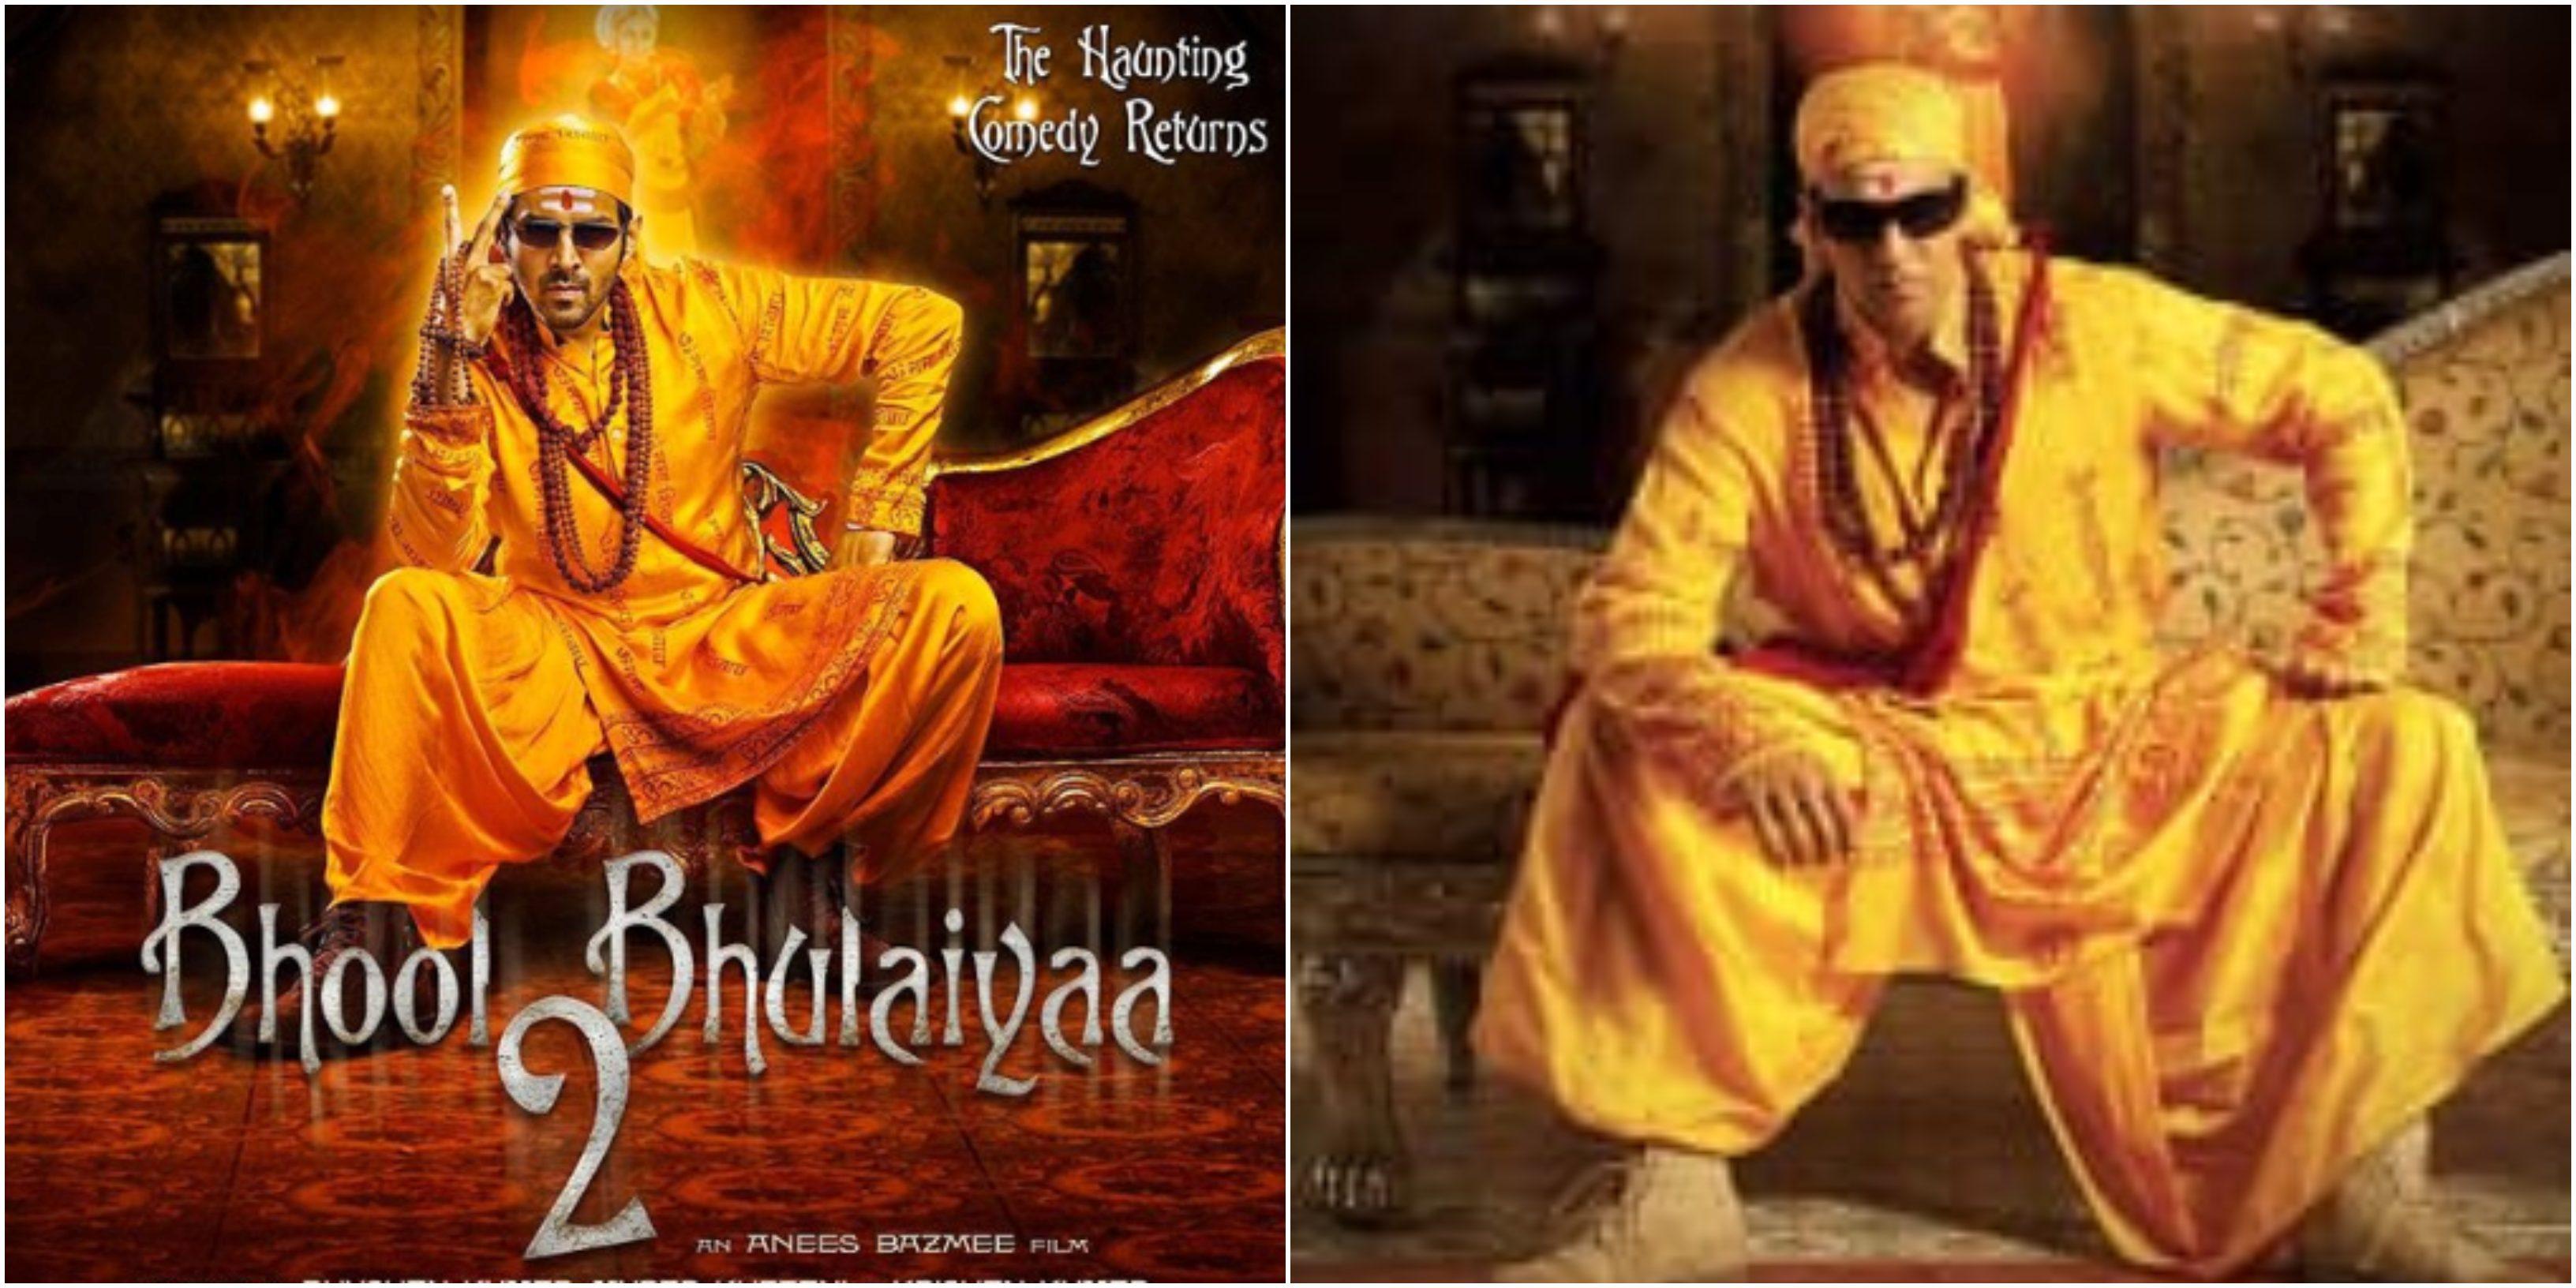 Bhool Bhulaiyaa 2, Kartik Aaryan, Akshay Kumar, Bollywood, NewsMobile, Mobile, News, India, Entertainment, Bollywood